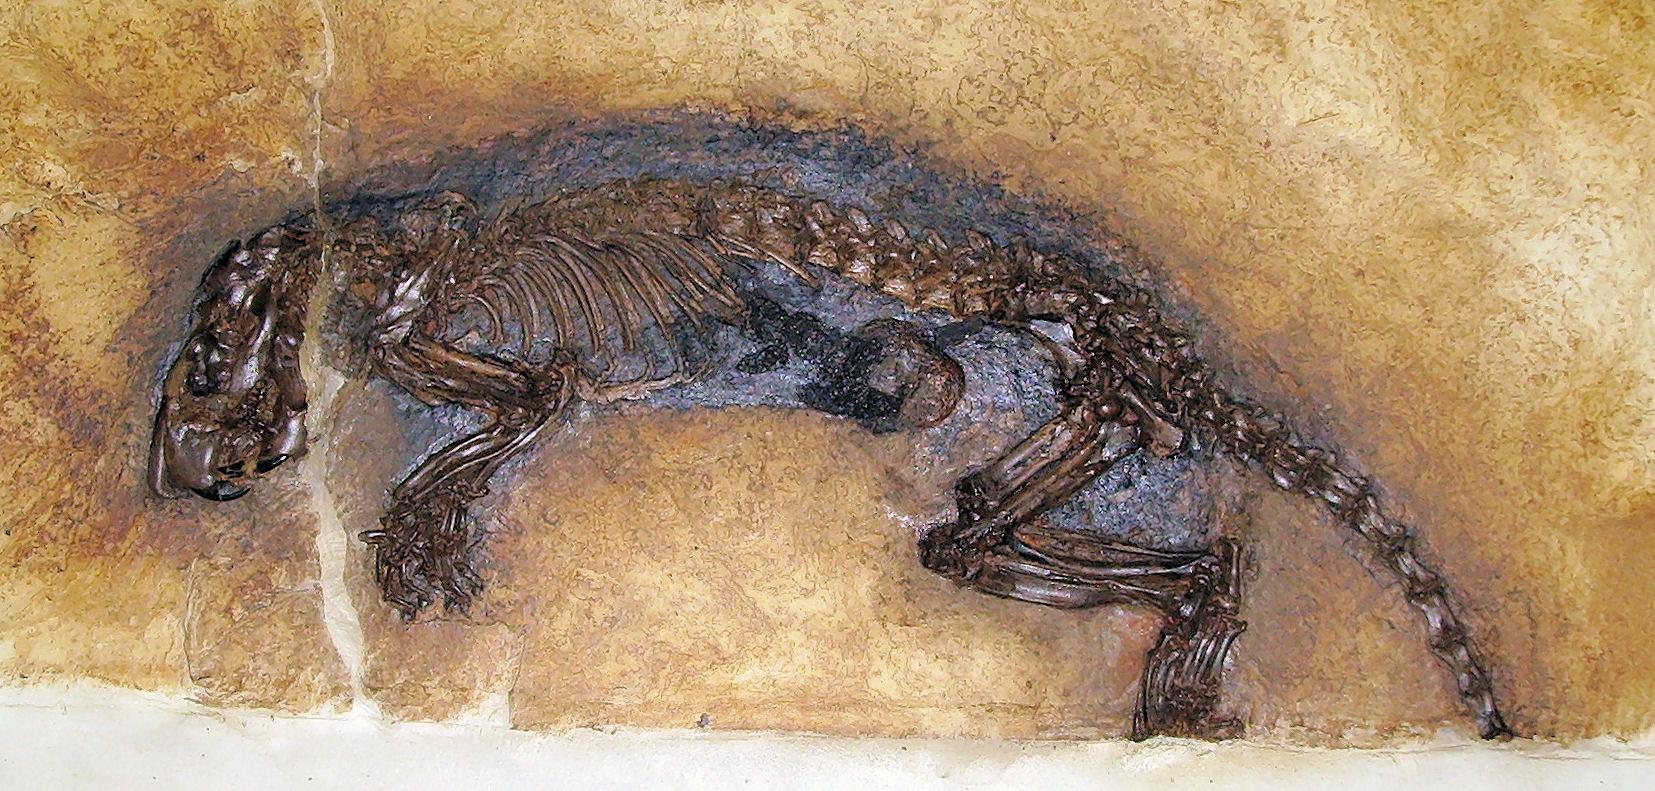 asillamyssp.fossilfromtheesselitfossilsite